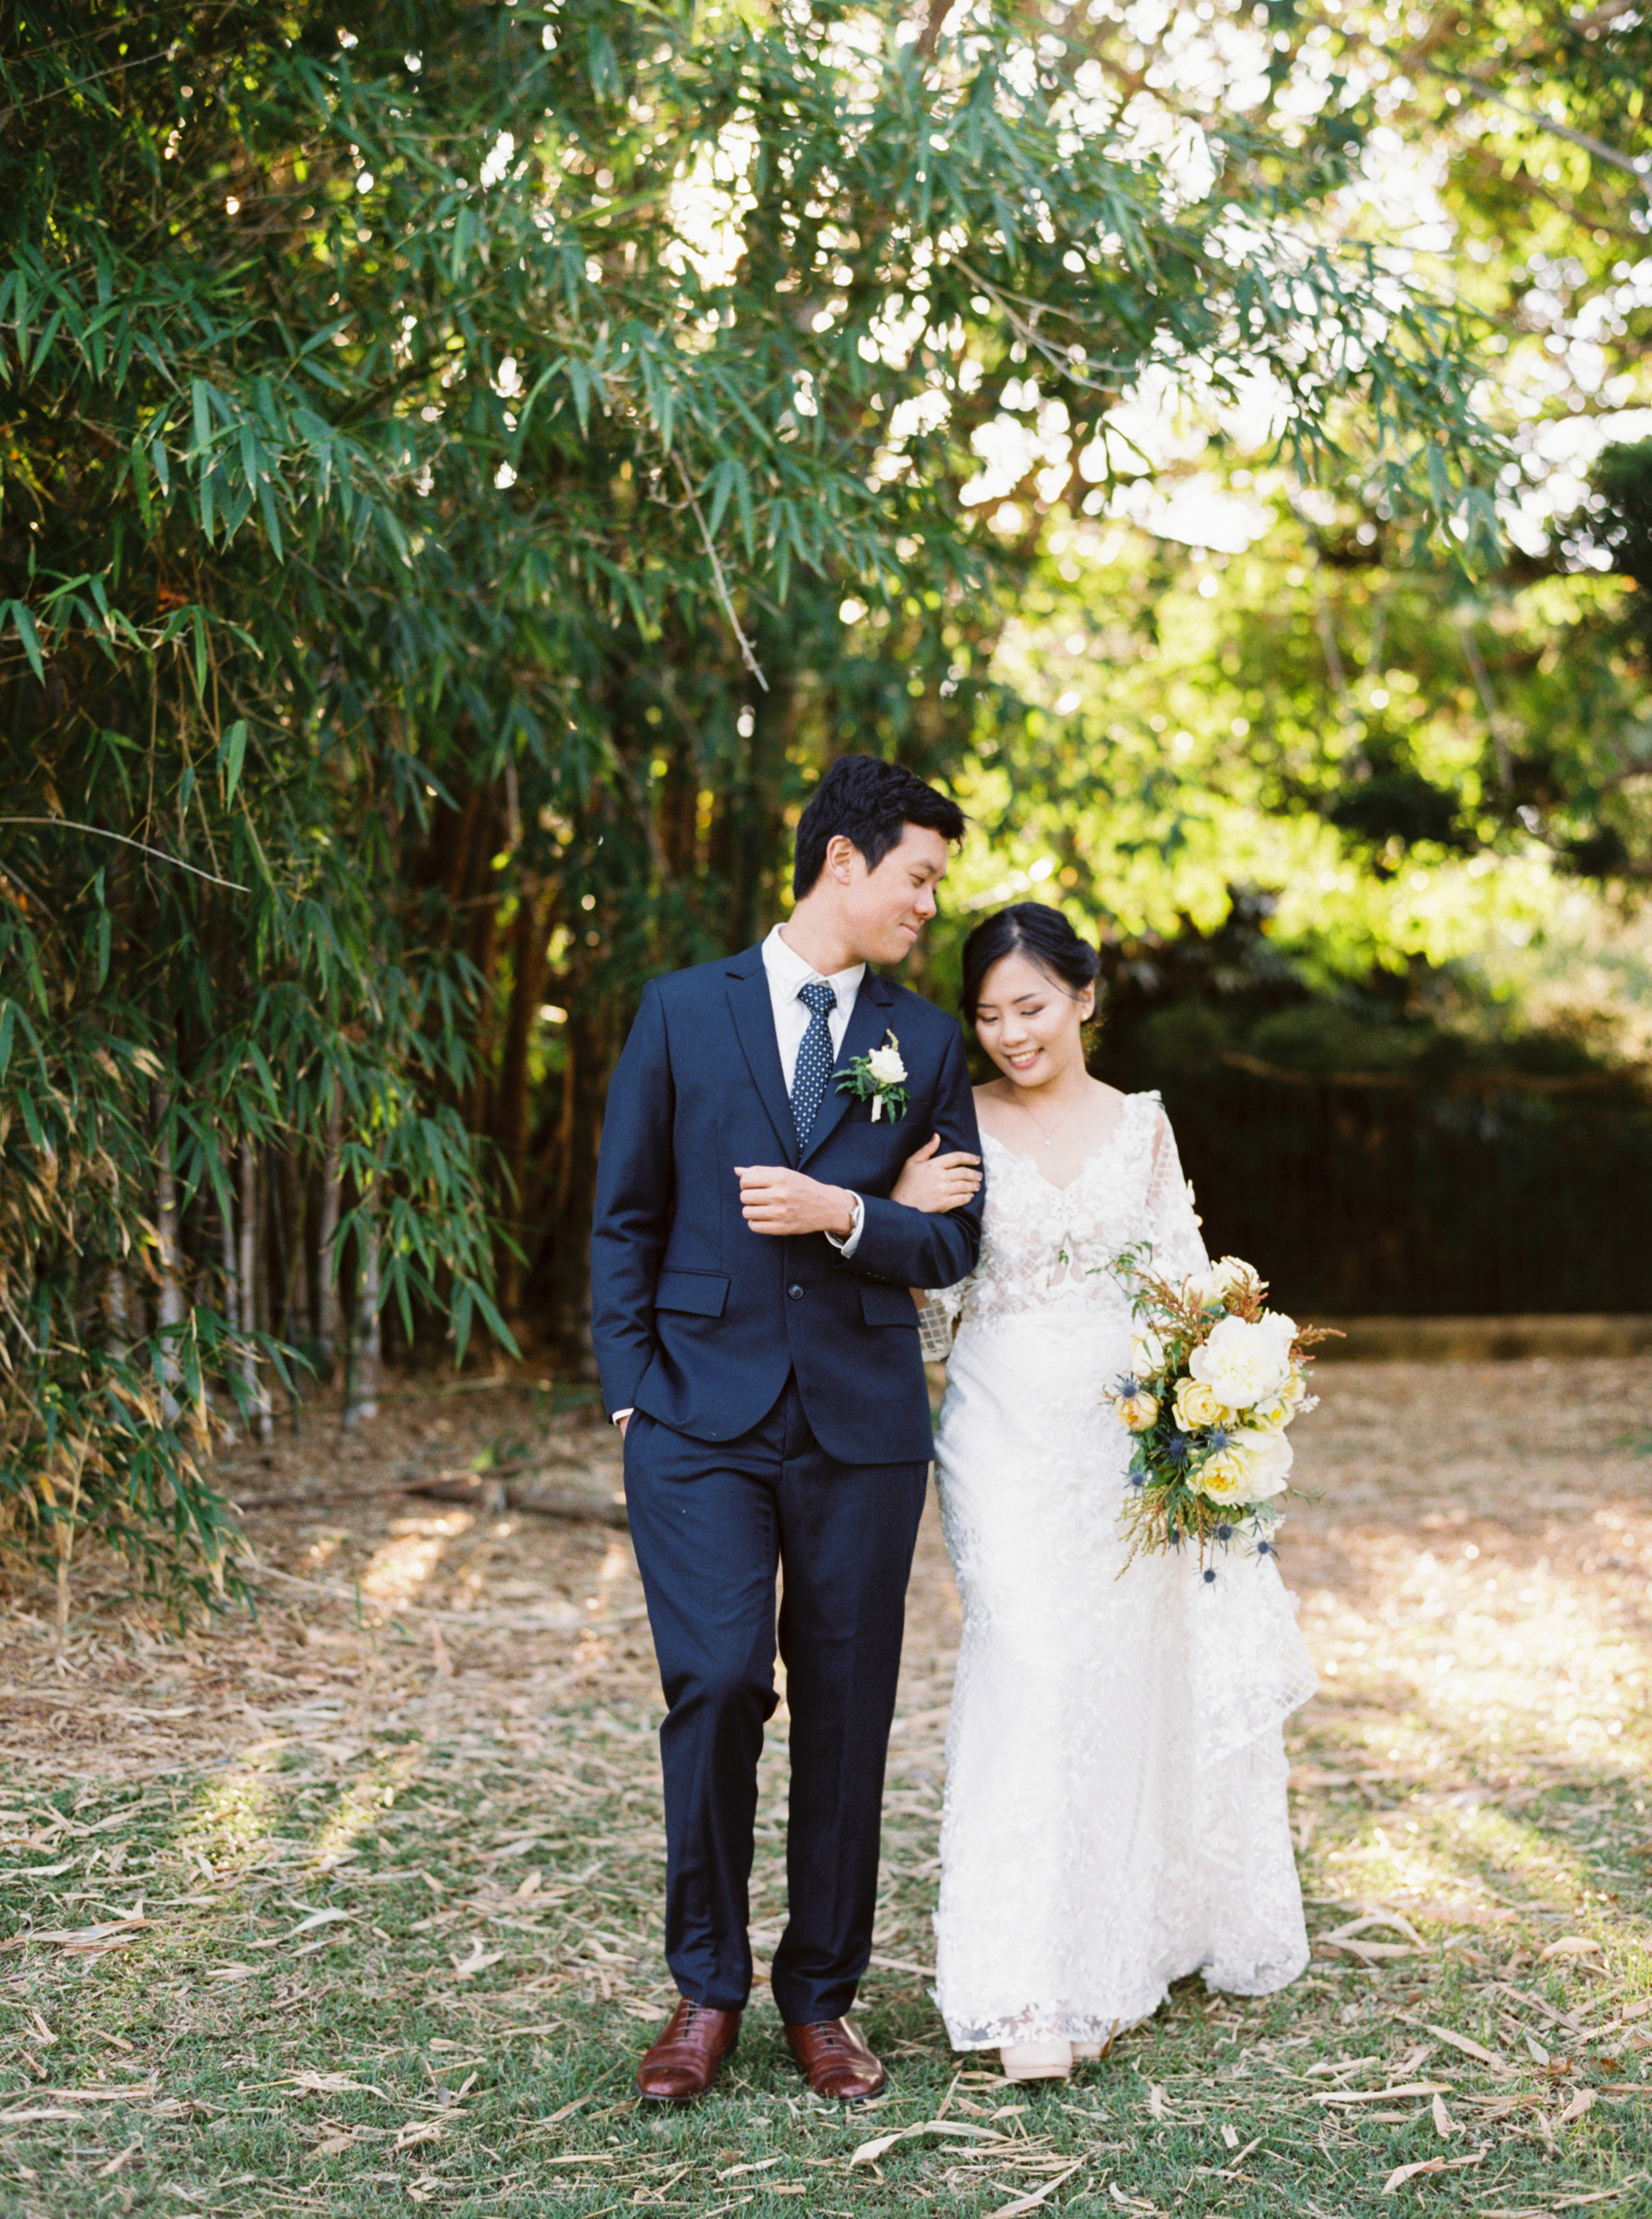 00026- Australia Sydney Wedding Photographer Sheri McMahon.jpg